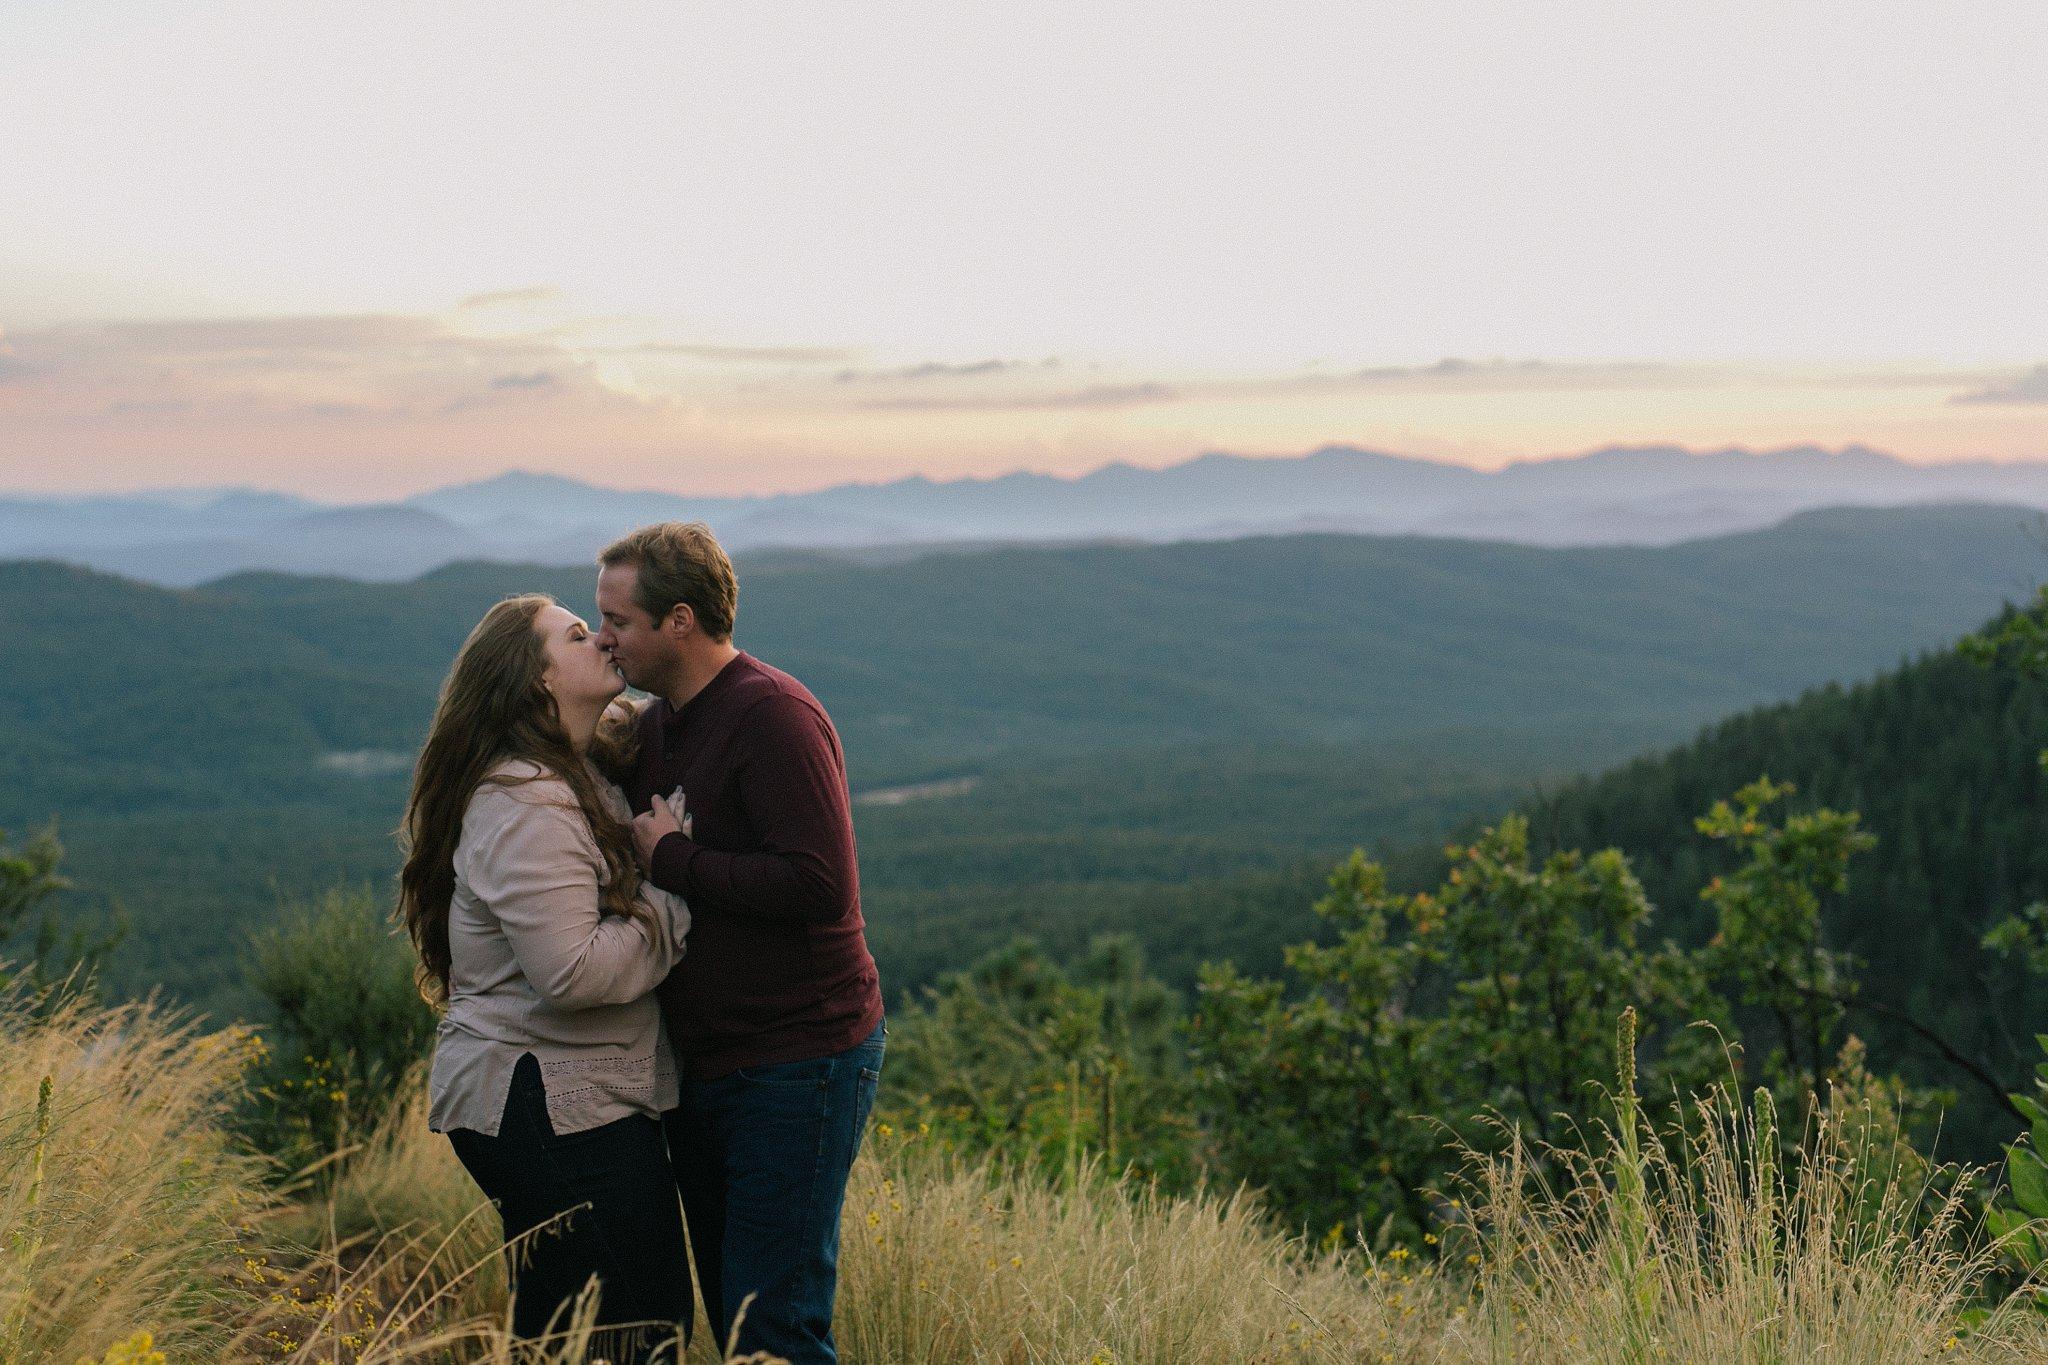 beautiful scenic mountain engagement session in Arizona